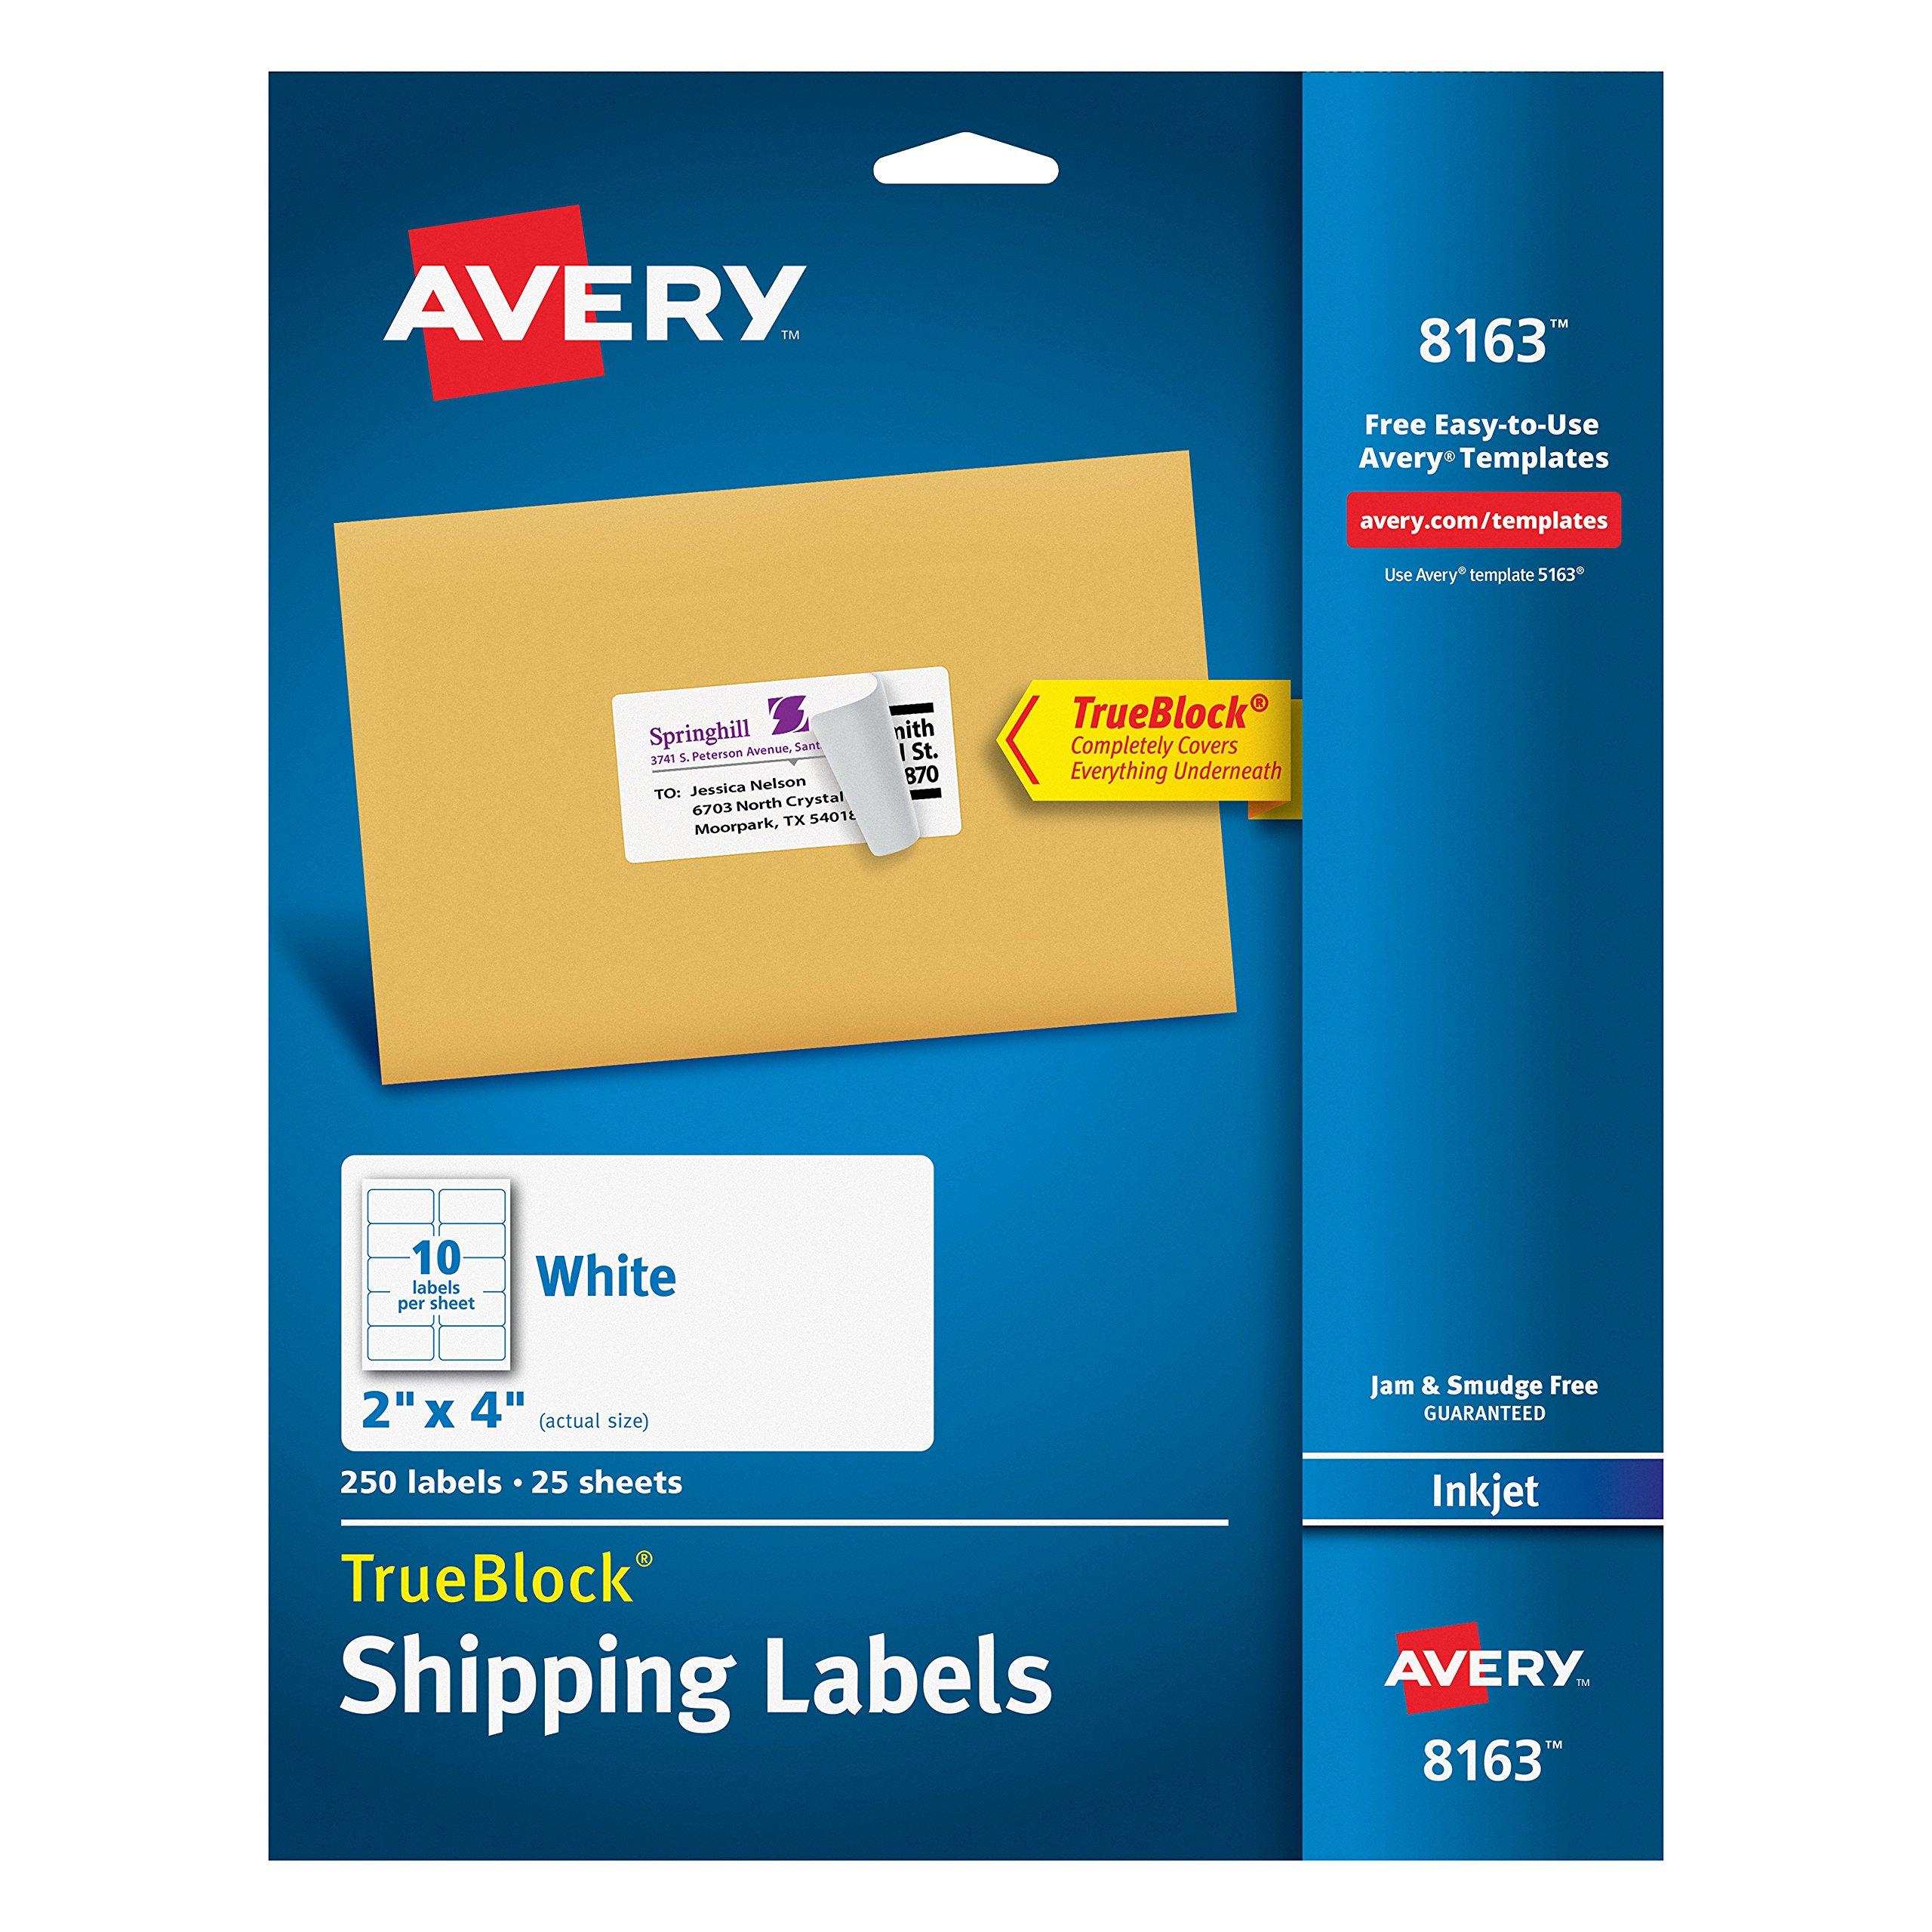 Avery Shipping Address Labels, Inkjet Printers, 250 Labels, 2x4 Labels, Permanent Adhesive, TrueBlock (8163)